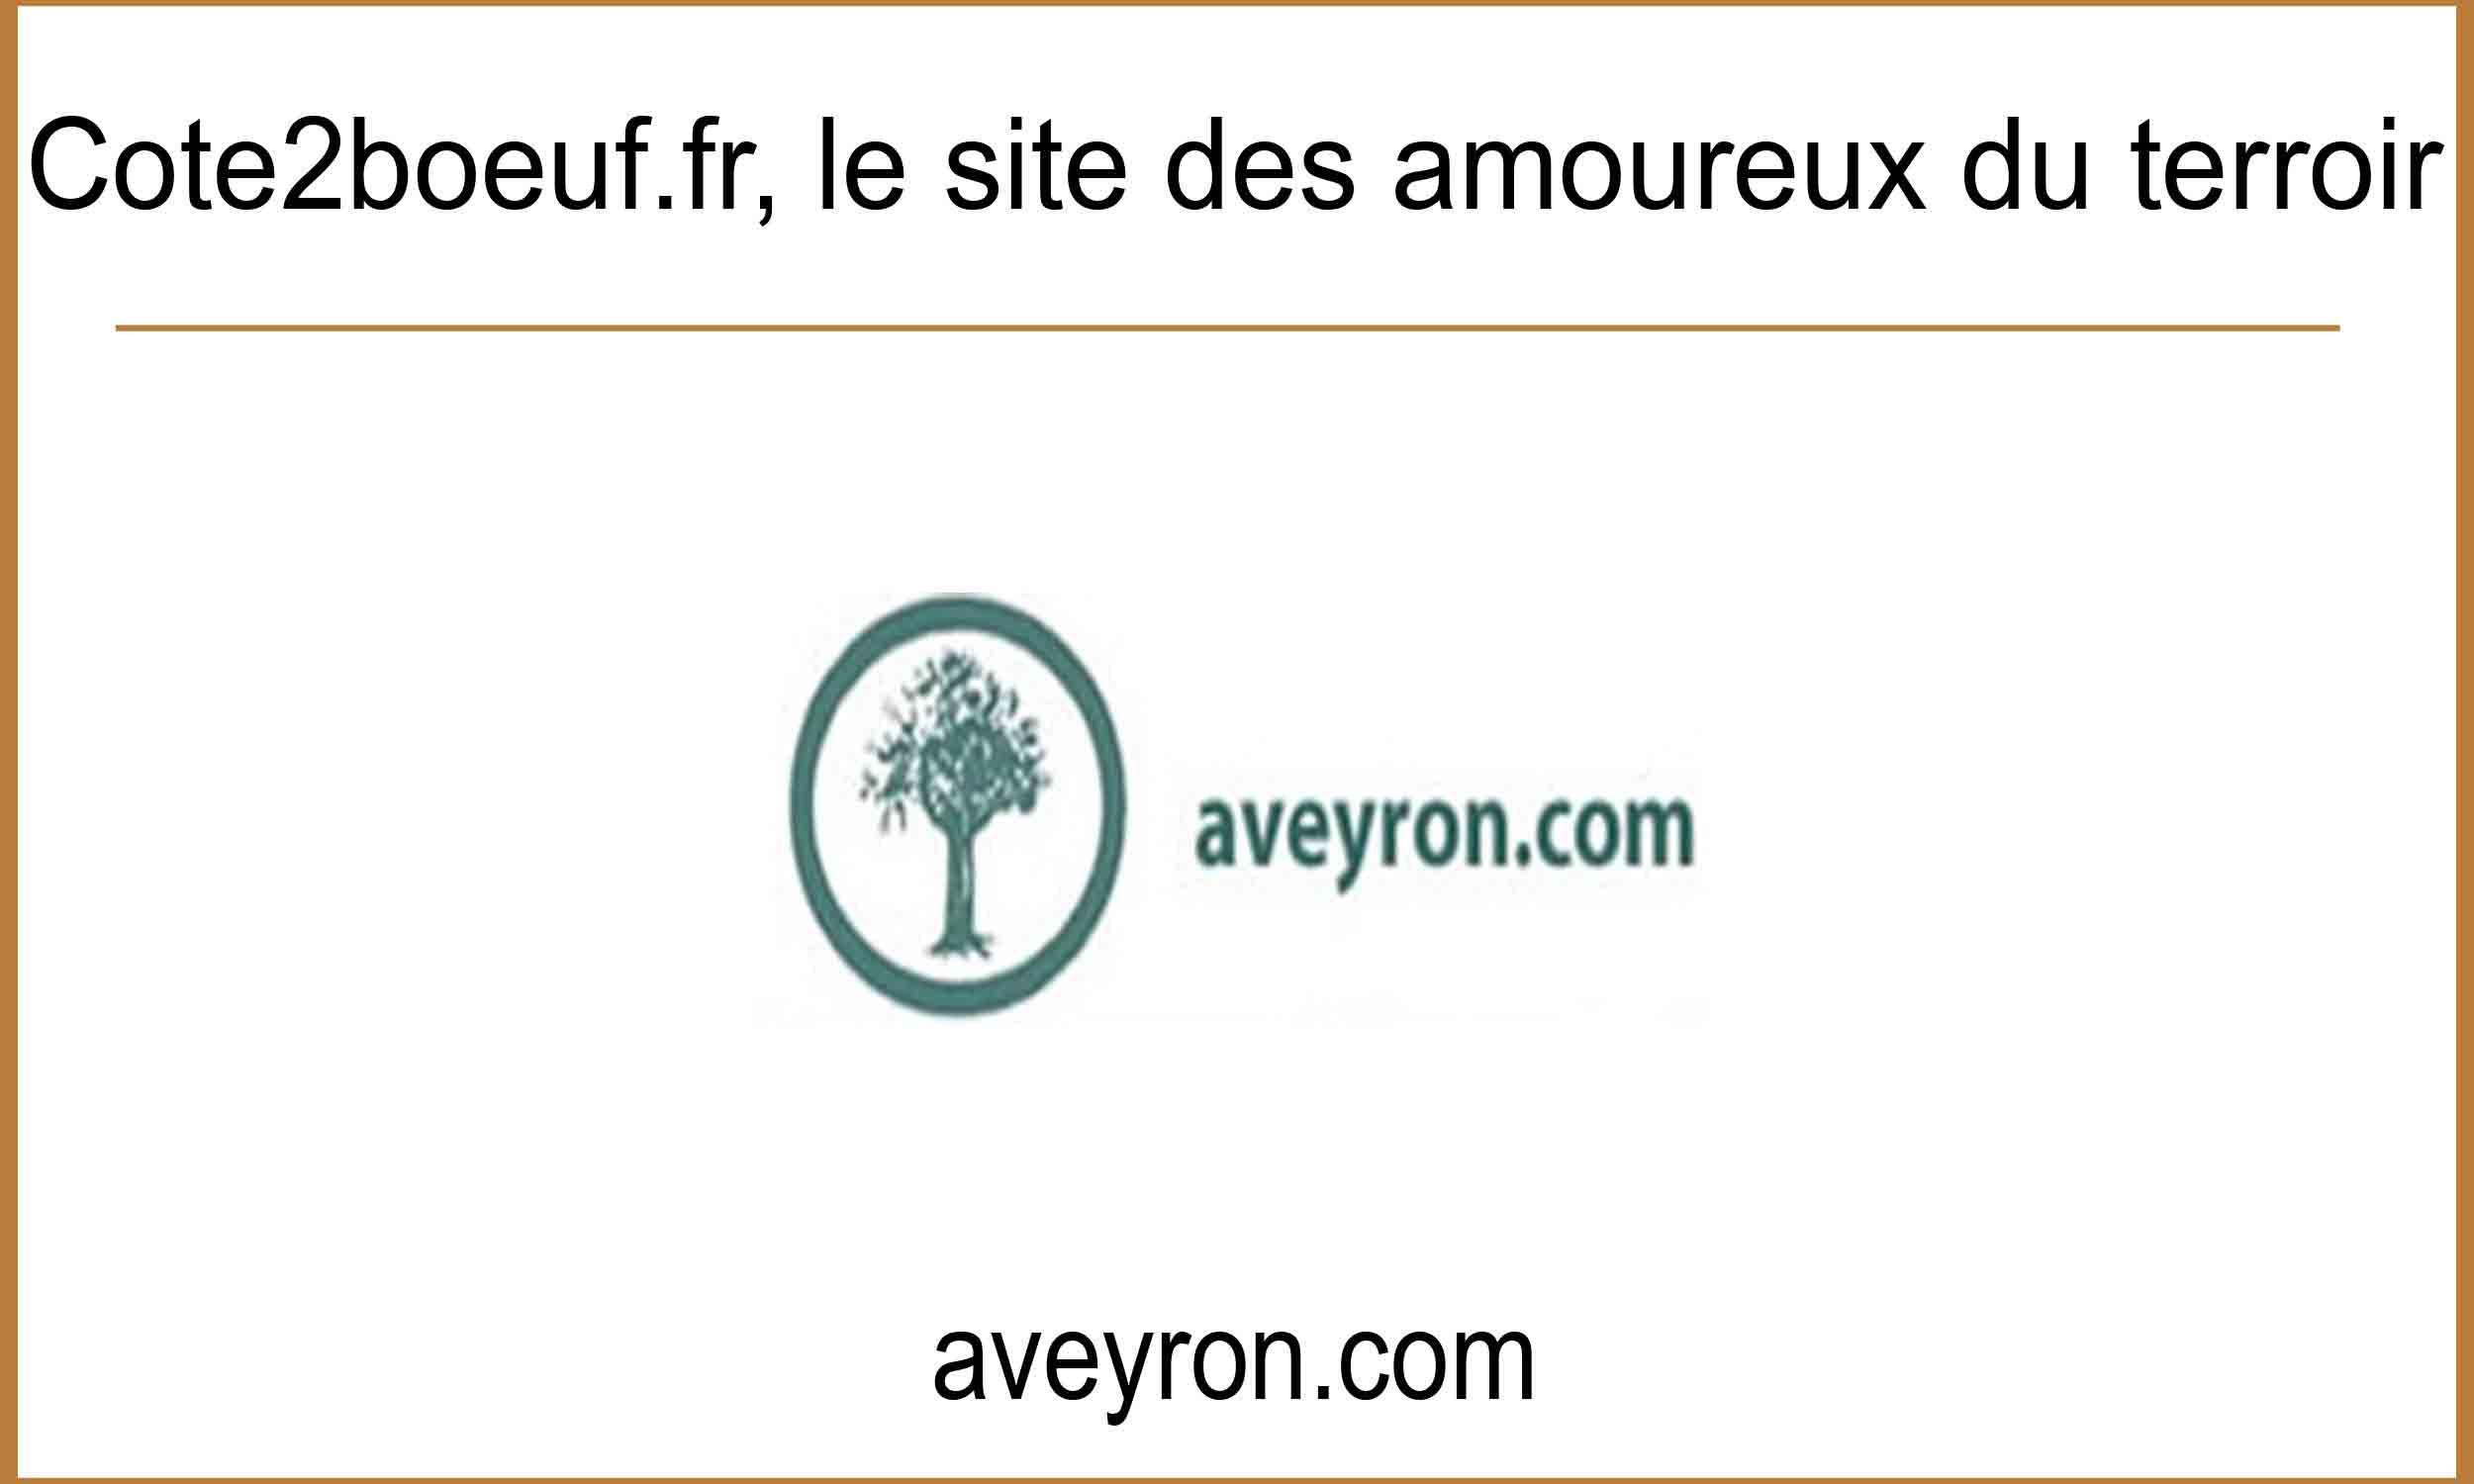 Aveyron.com